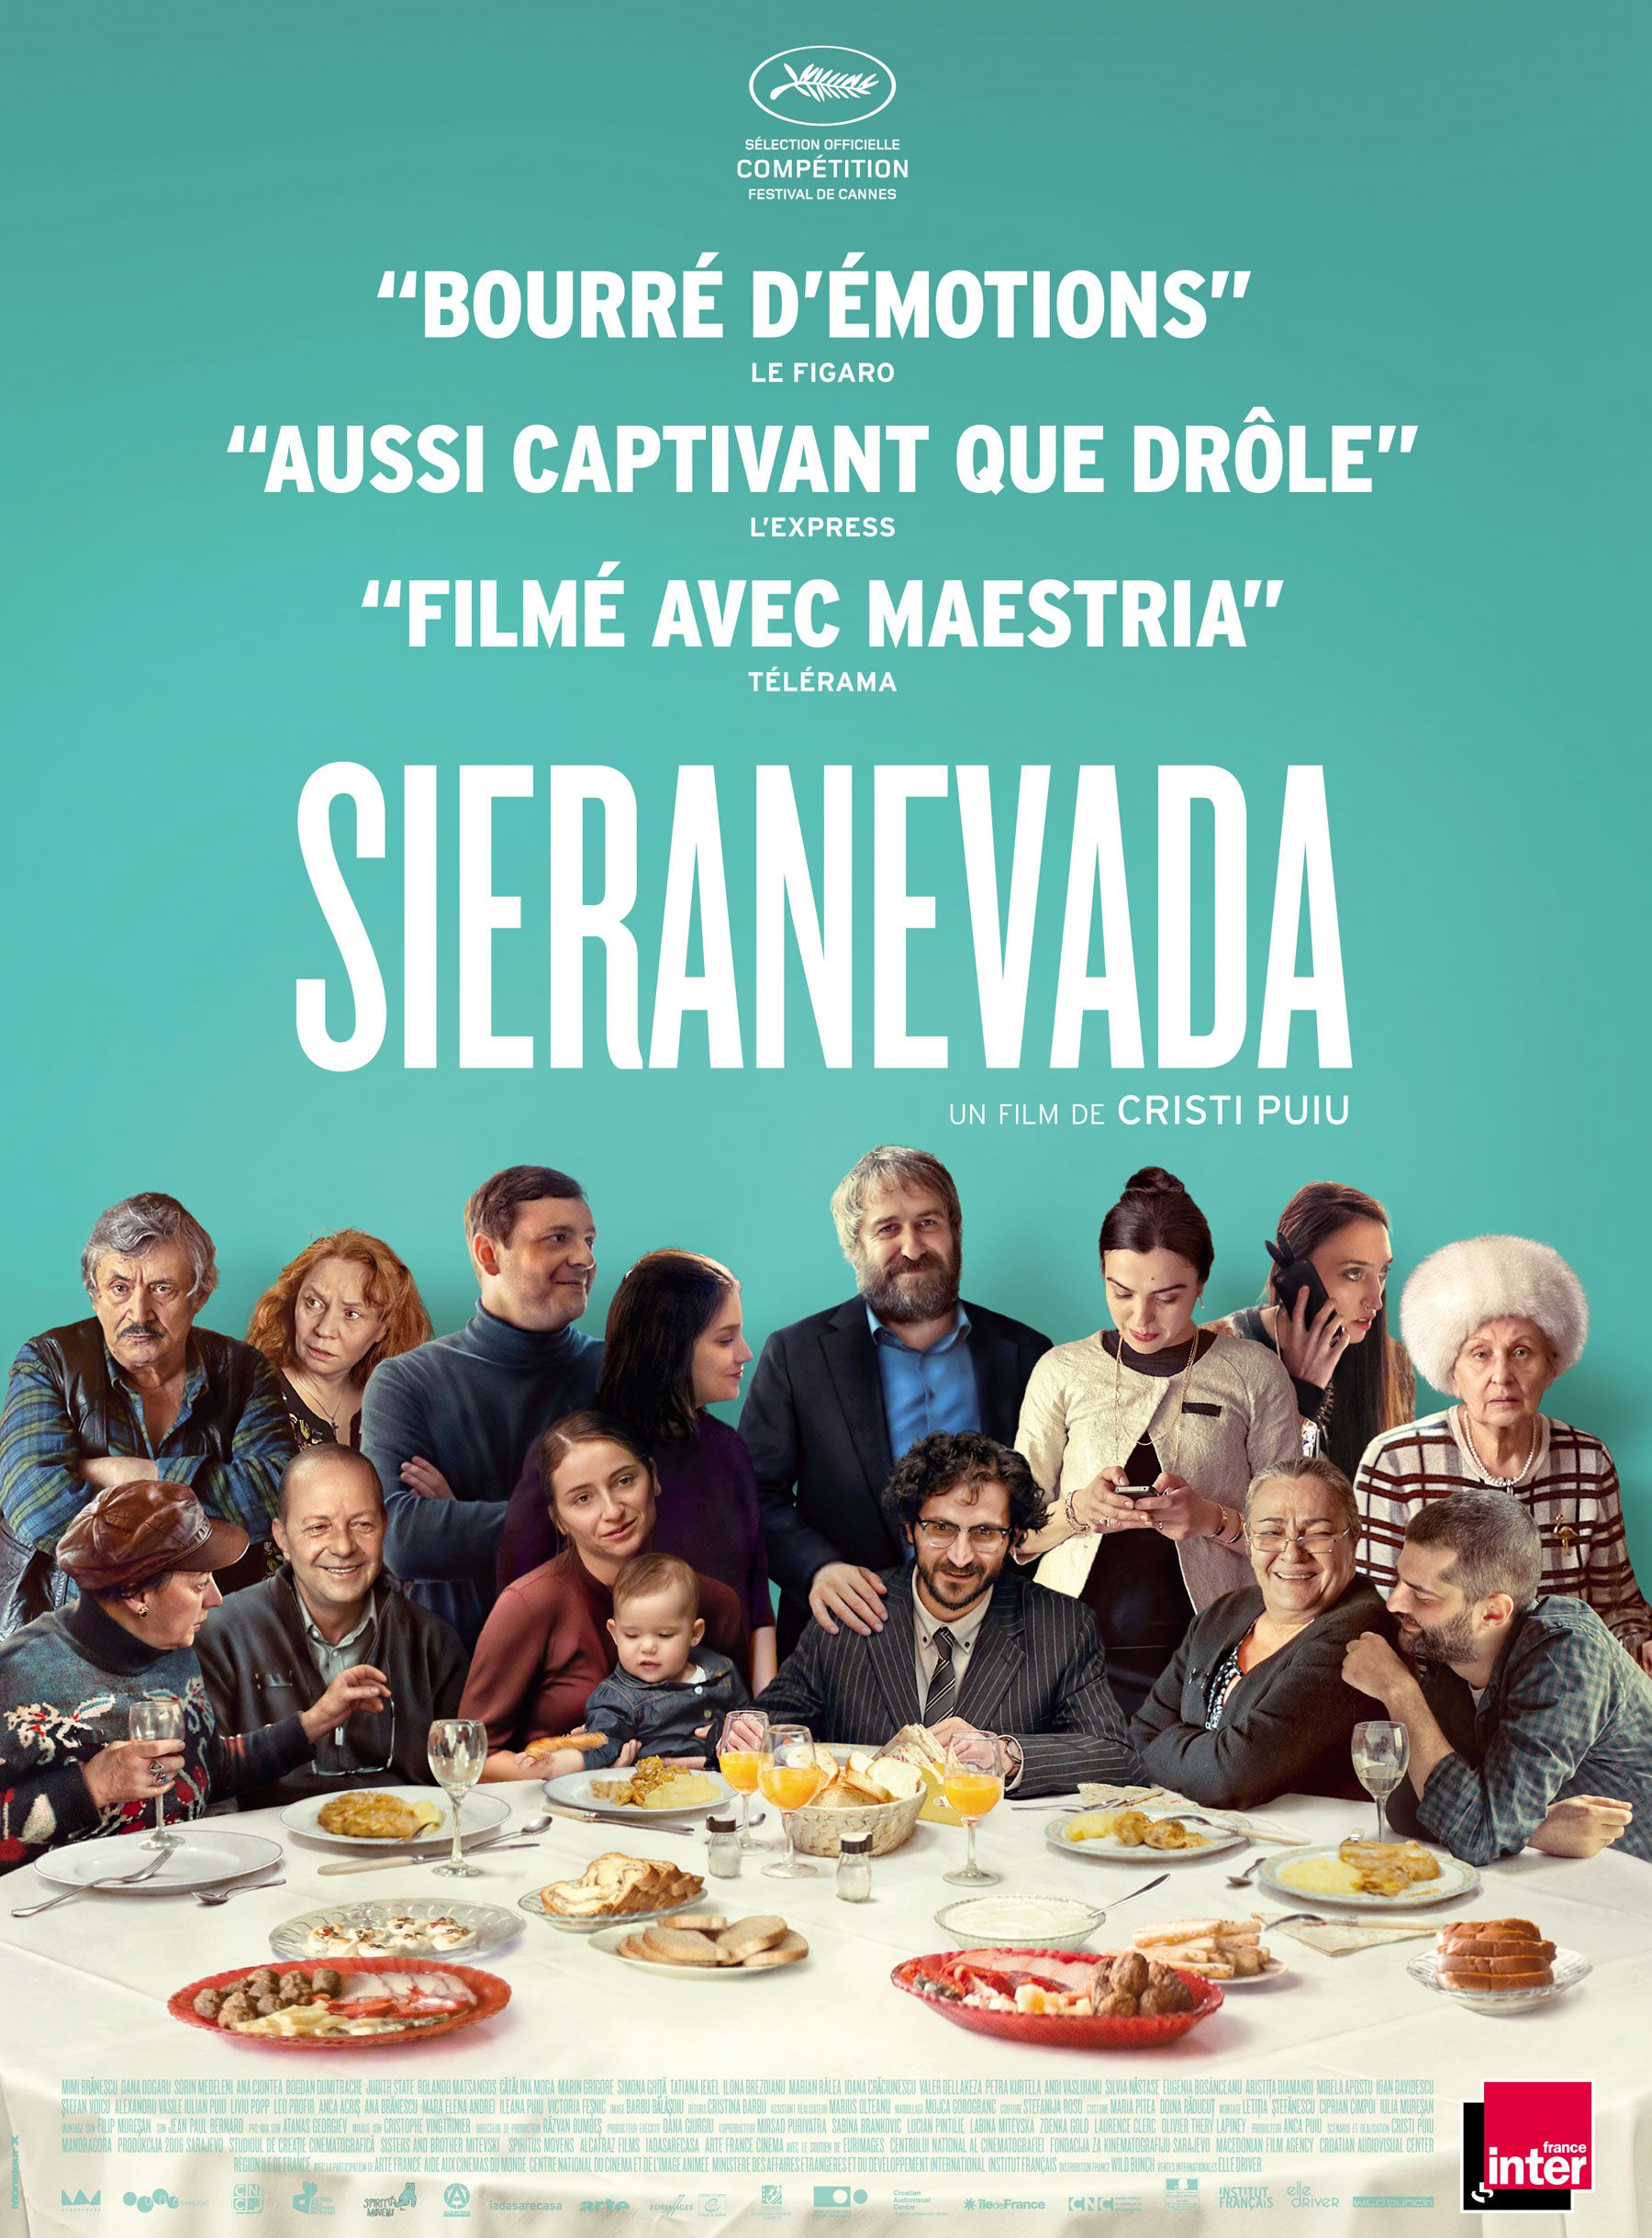 Sieranevada - Film (2016)